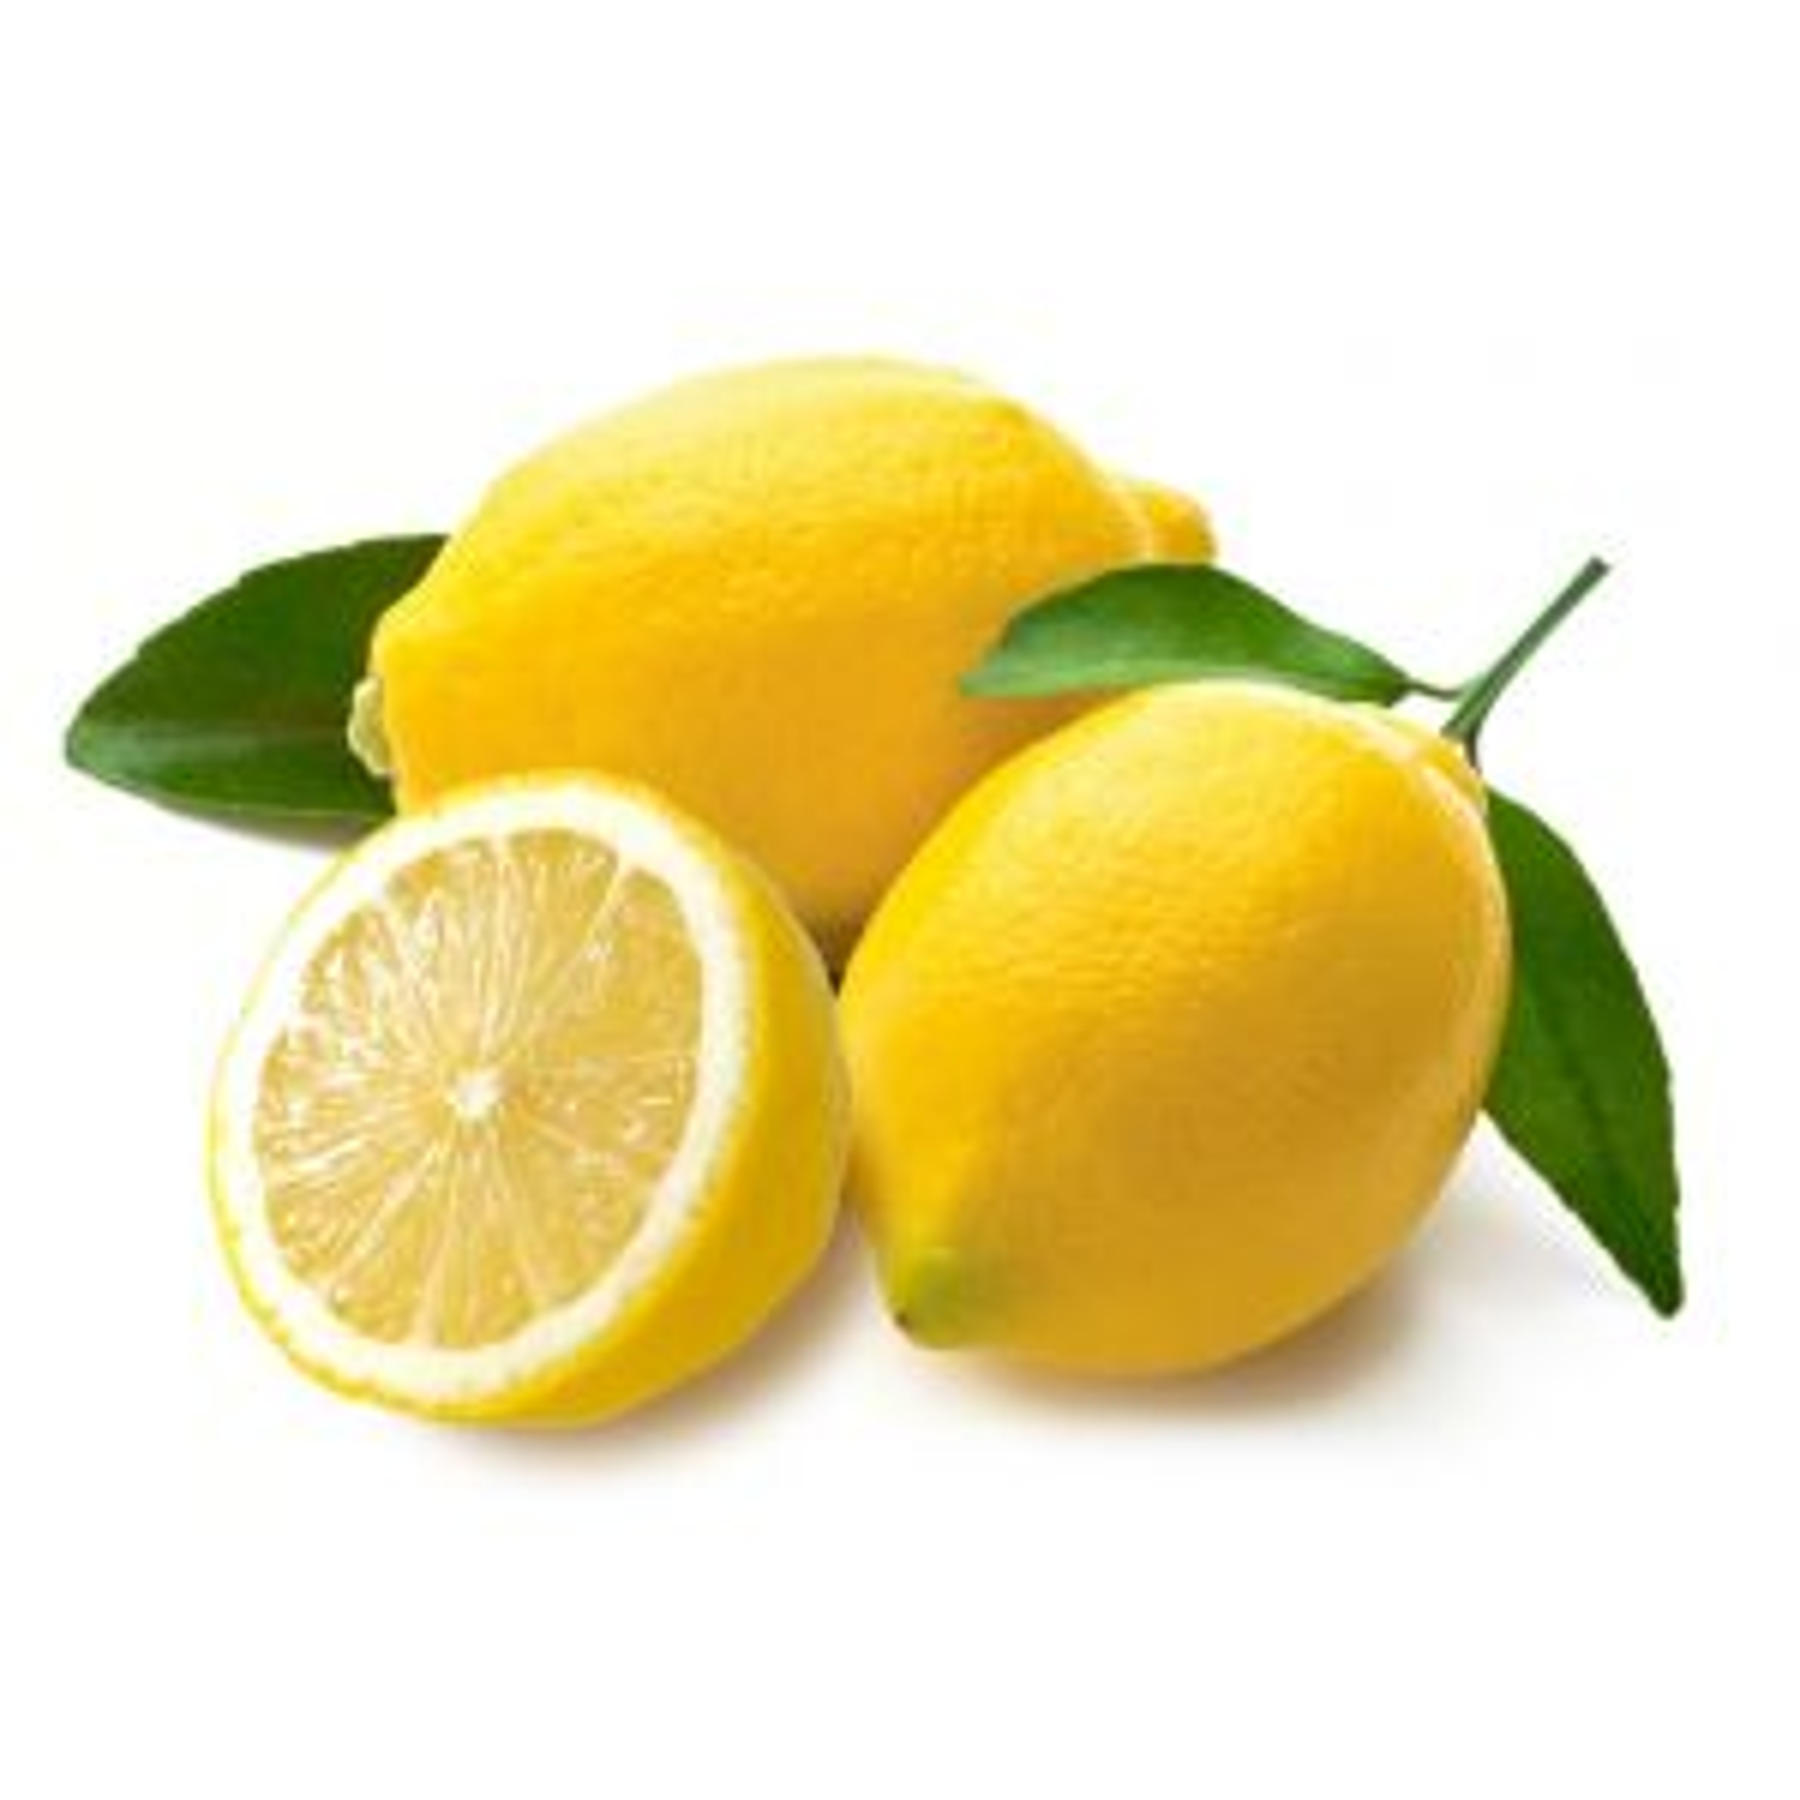 Skoddejuice Lemon Sicily Aroma